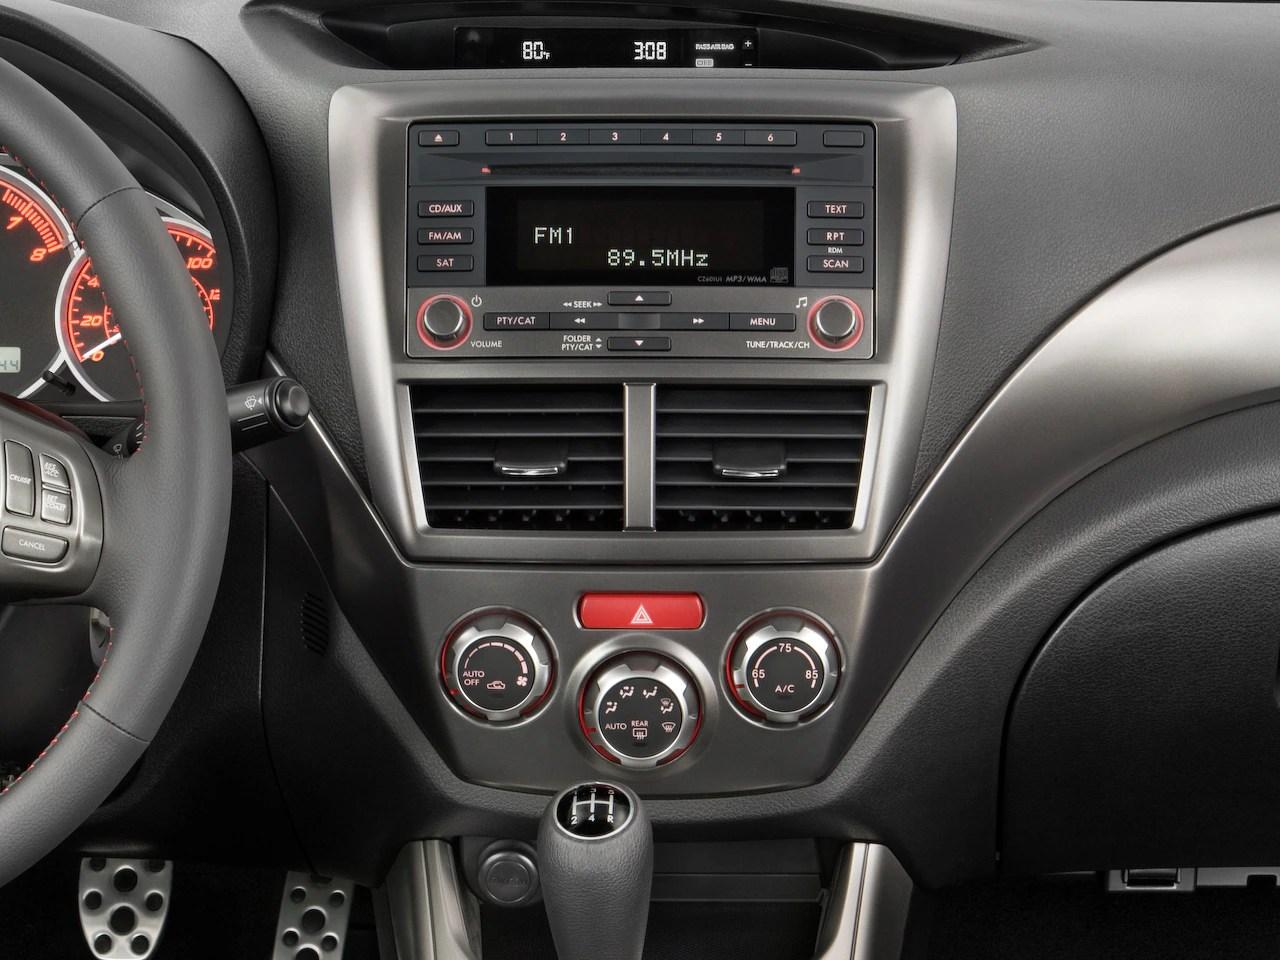 2009 Subaru Impreza Reviews And Rating Motortrend